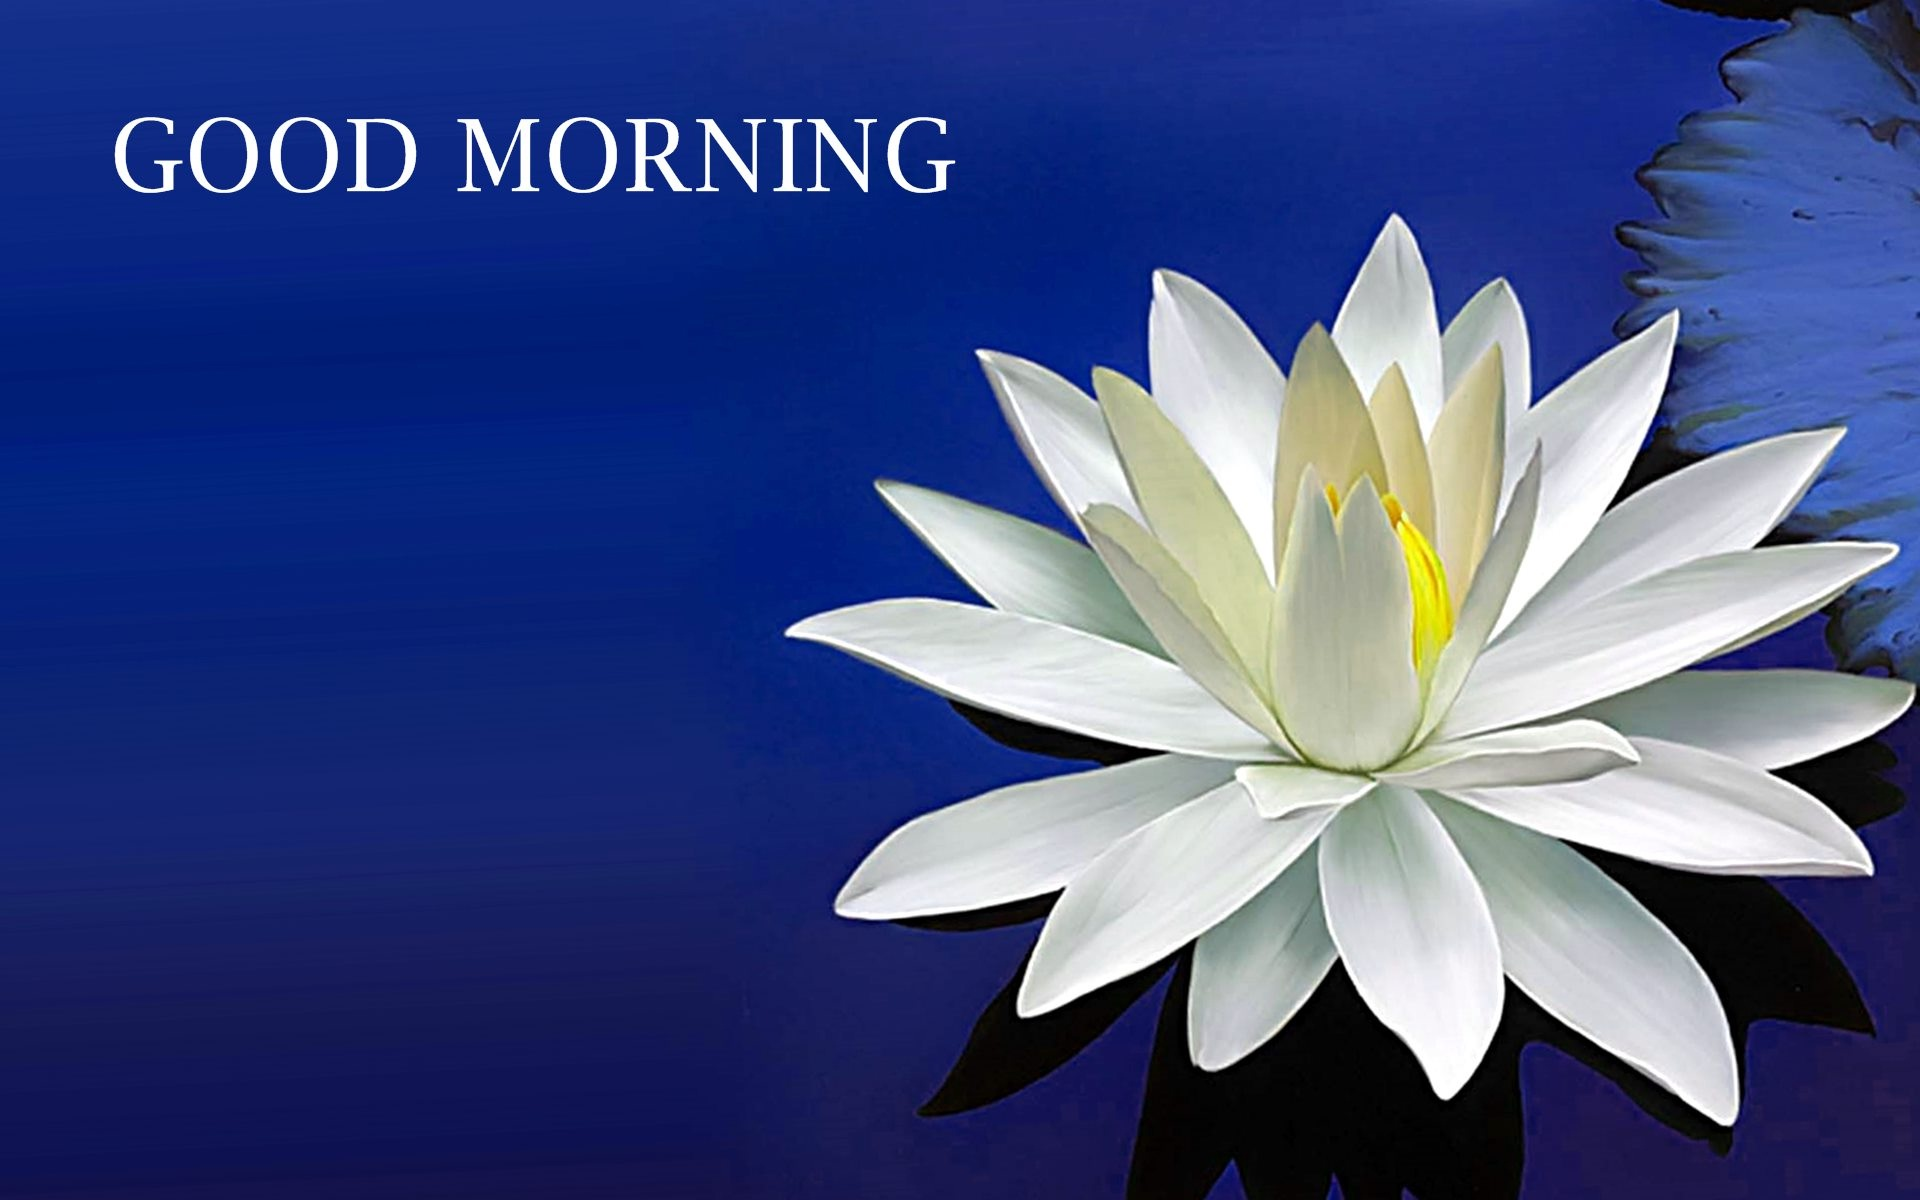 New Good Morning Wallpaper Wallpapersafari